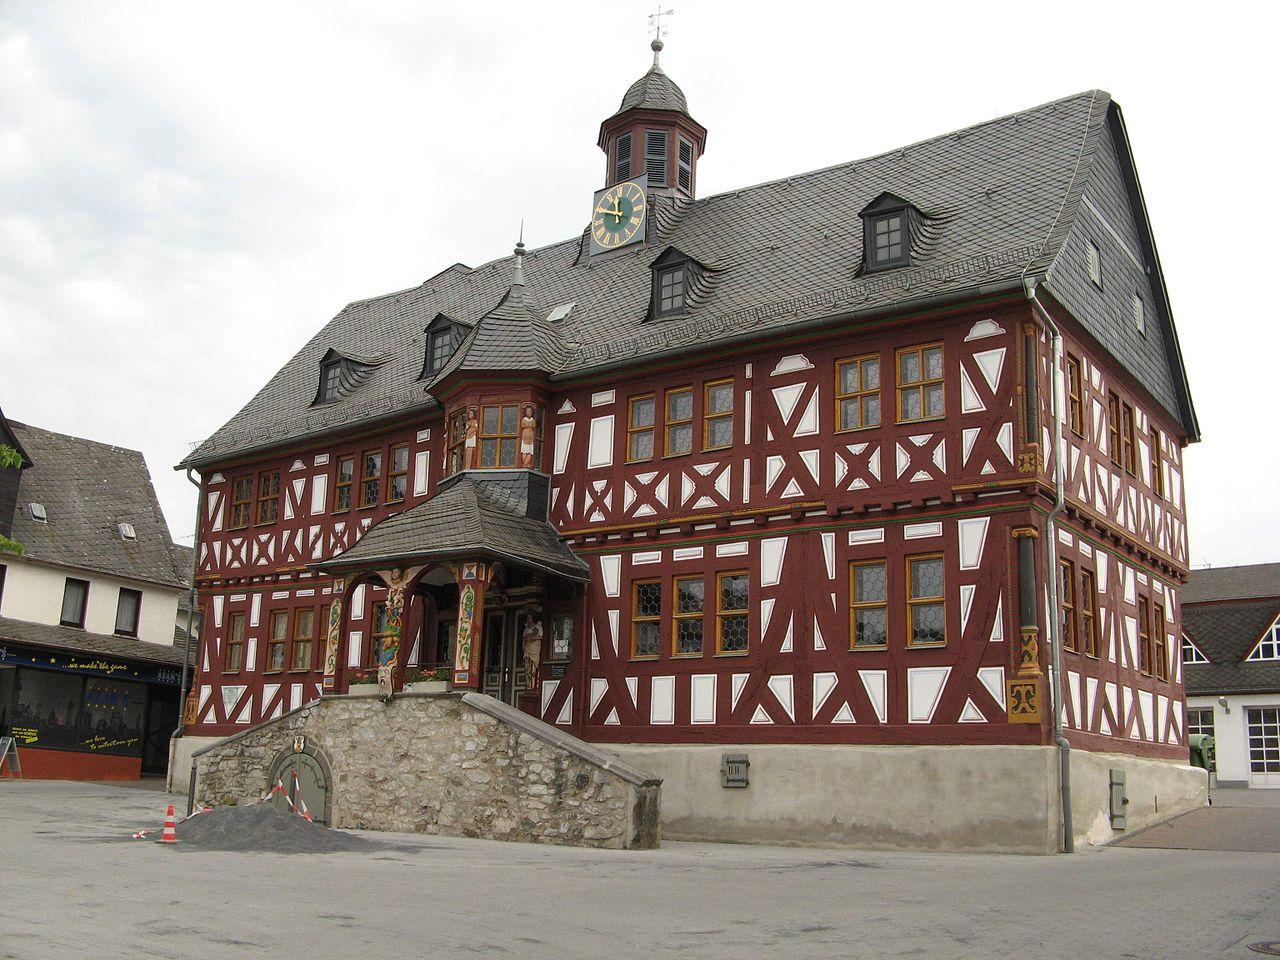 Bild Altes Rathaus Hadamar